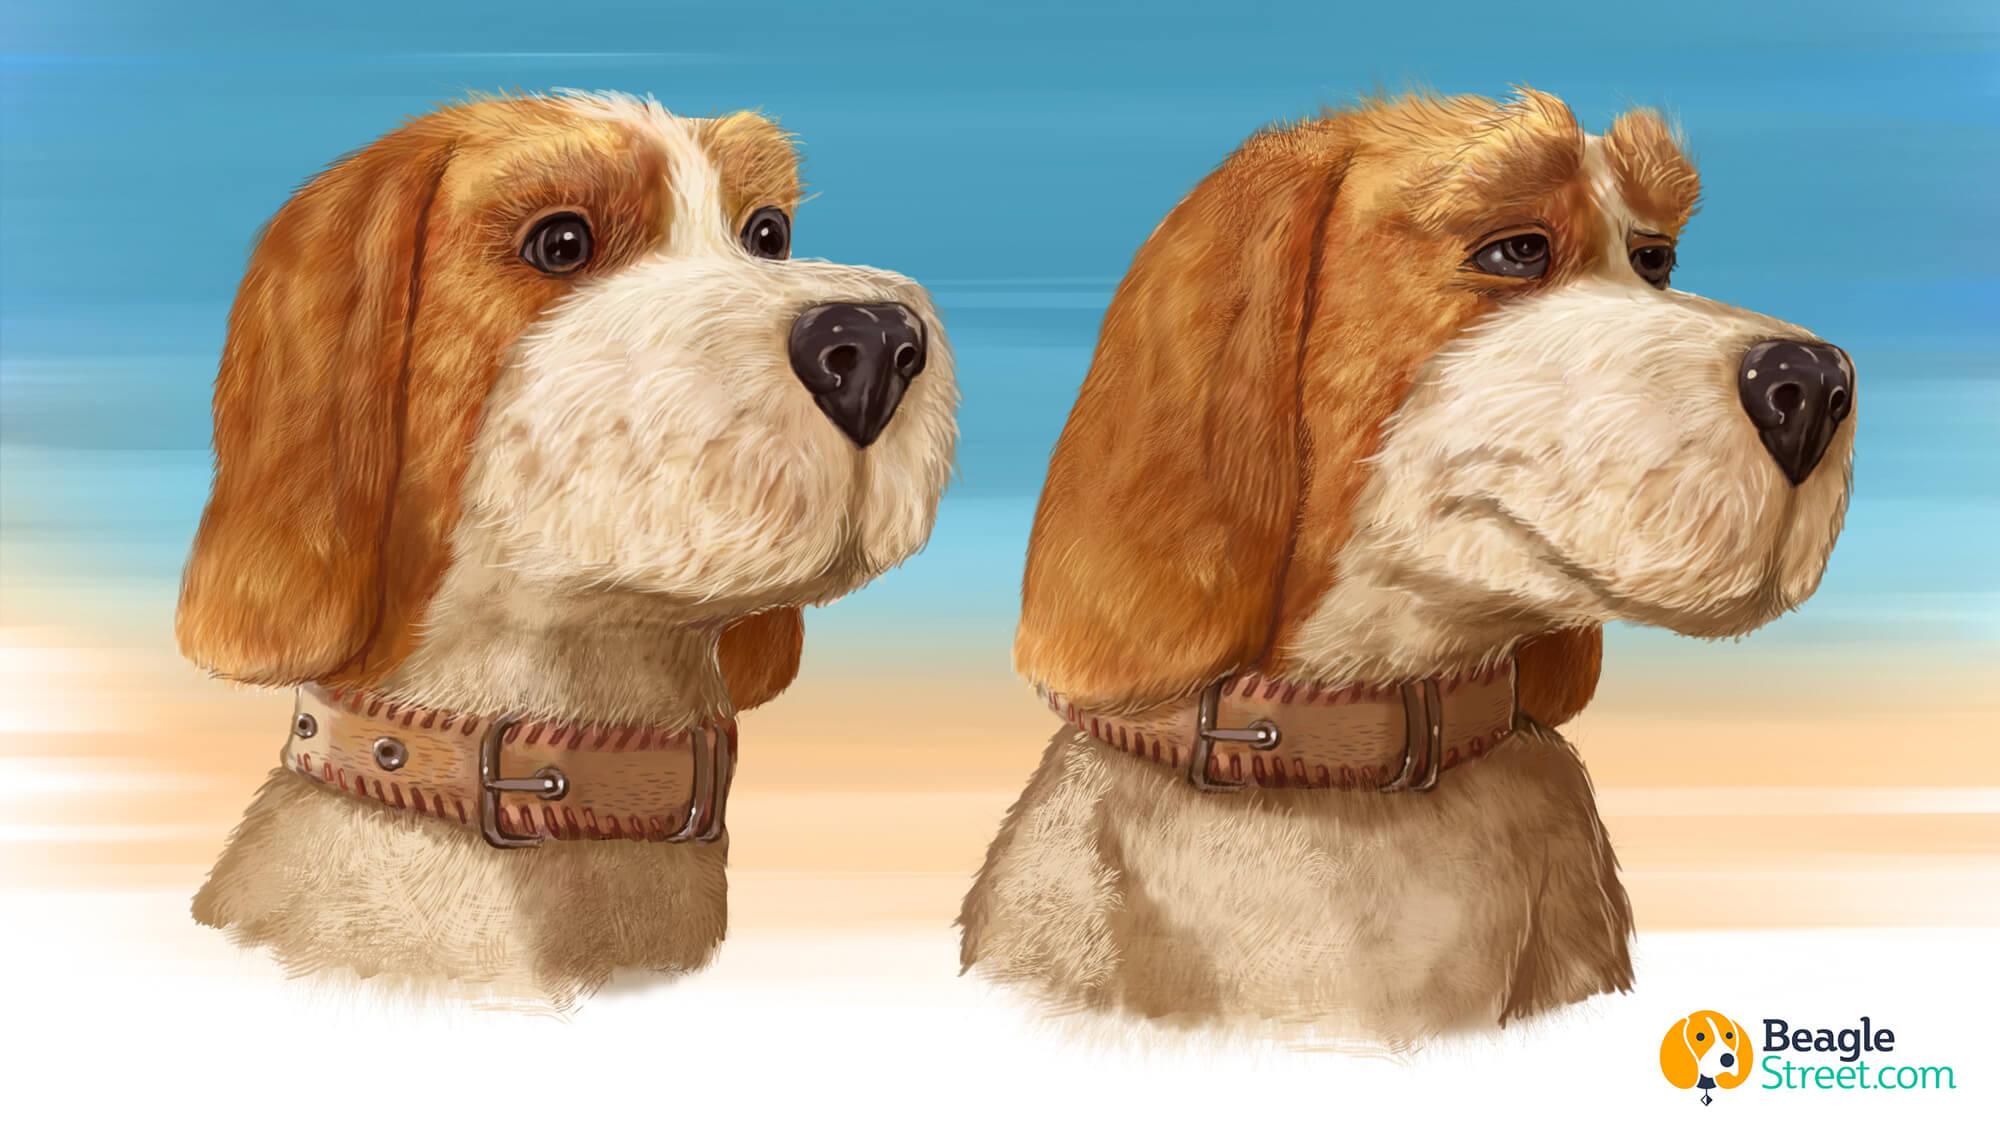 Beagle_Character_Design_2.jpg